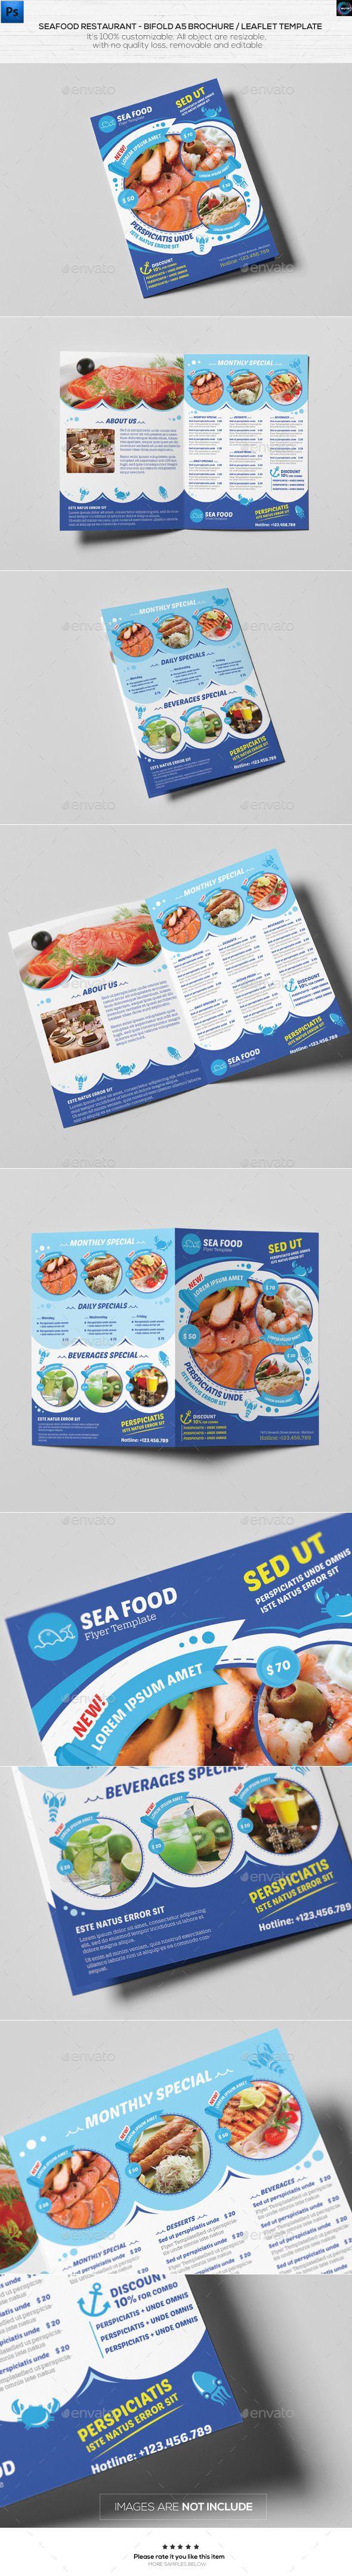 Seafood Restaurant-A5 Brochure/Leaflet Template - Catalog Brochure Template PSD. Download here: http://graphicriver.net/item/seafood-restauranta5-brochureleaflet-template/12341412?s_rank=1725&ref=yinkira